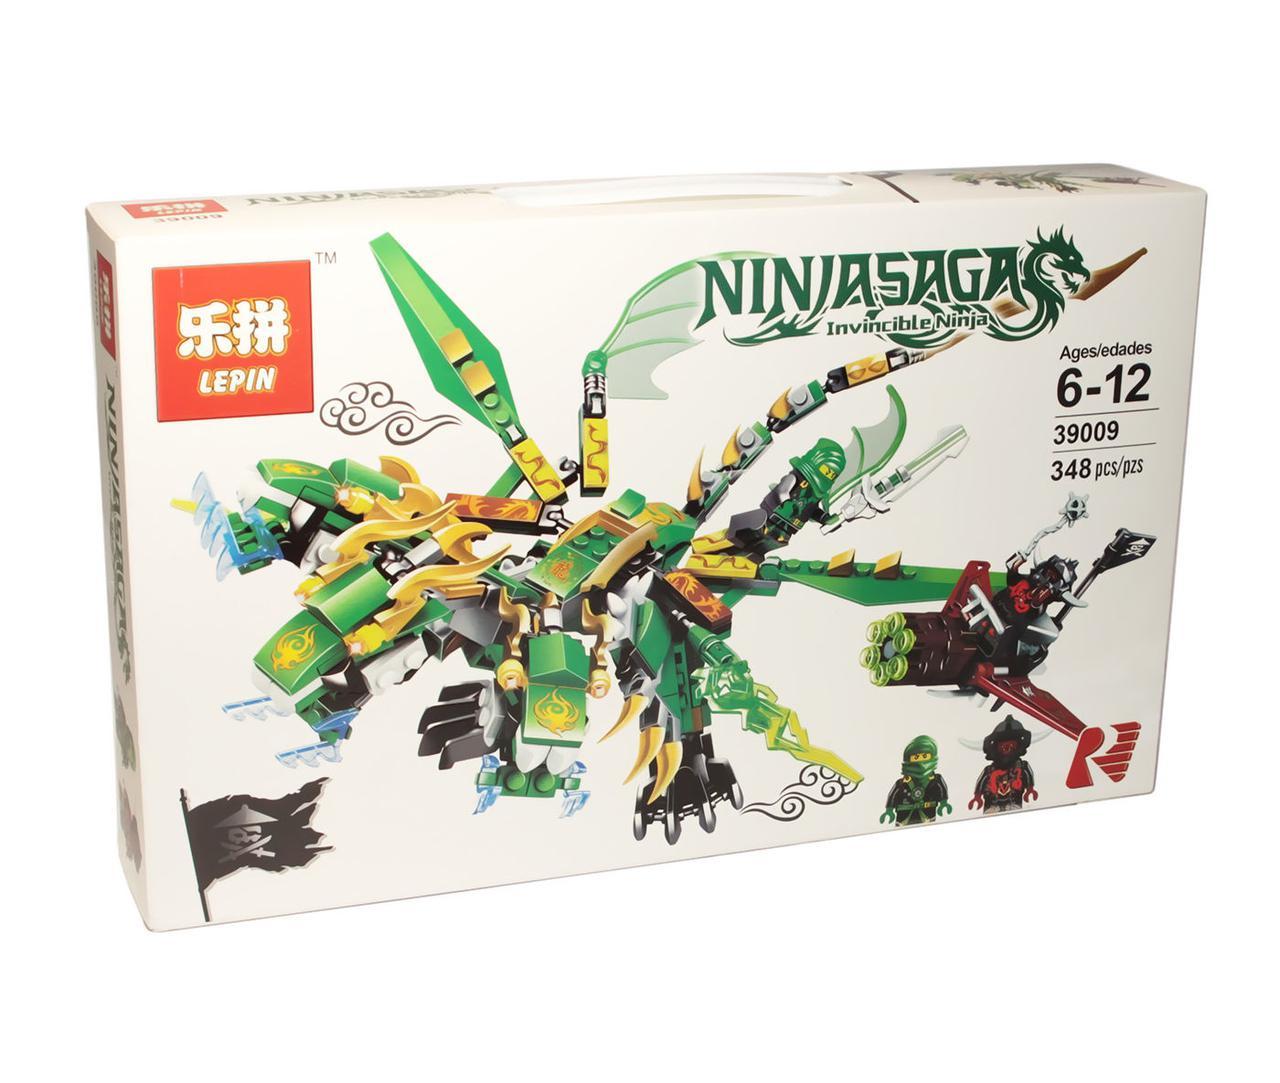 Конструктор аналог лего Lepin Ниндзяго (Трехголовый зеленый дракон), 3